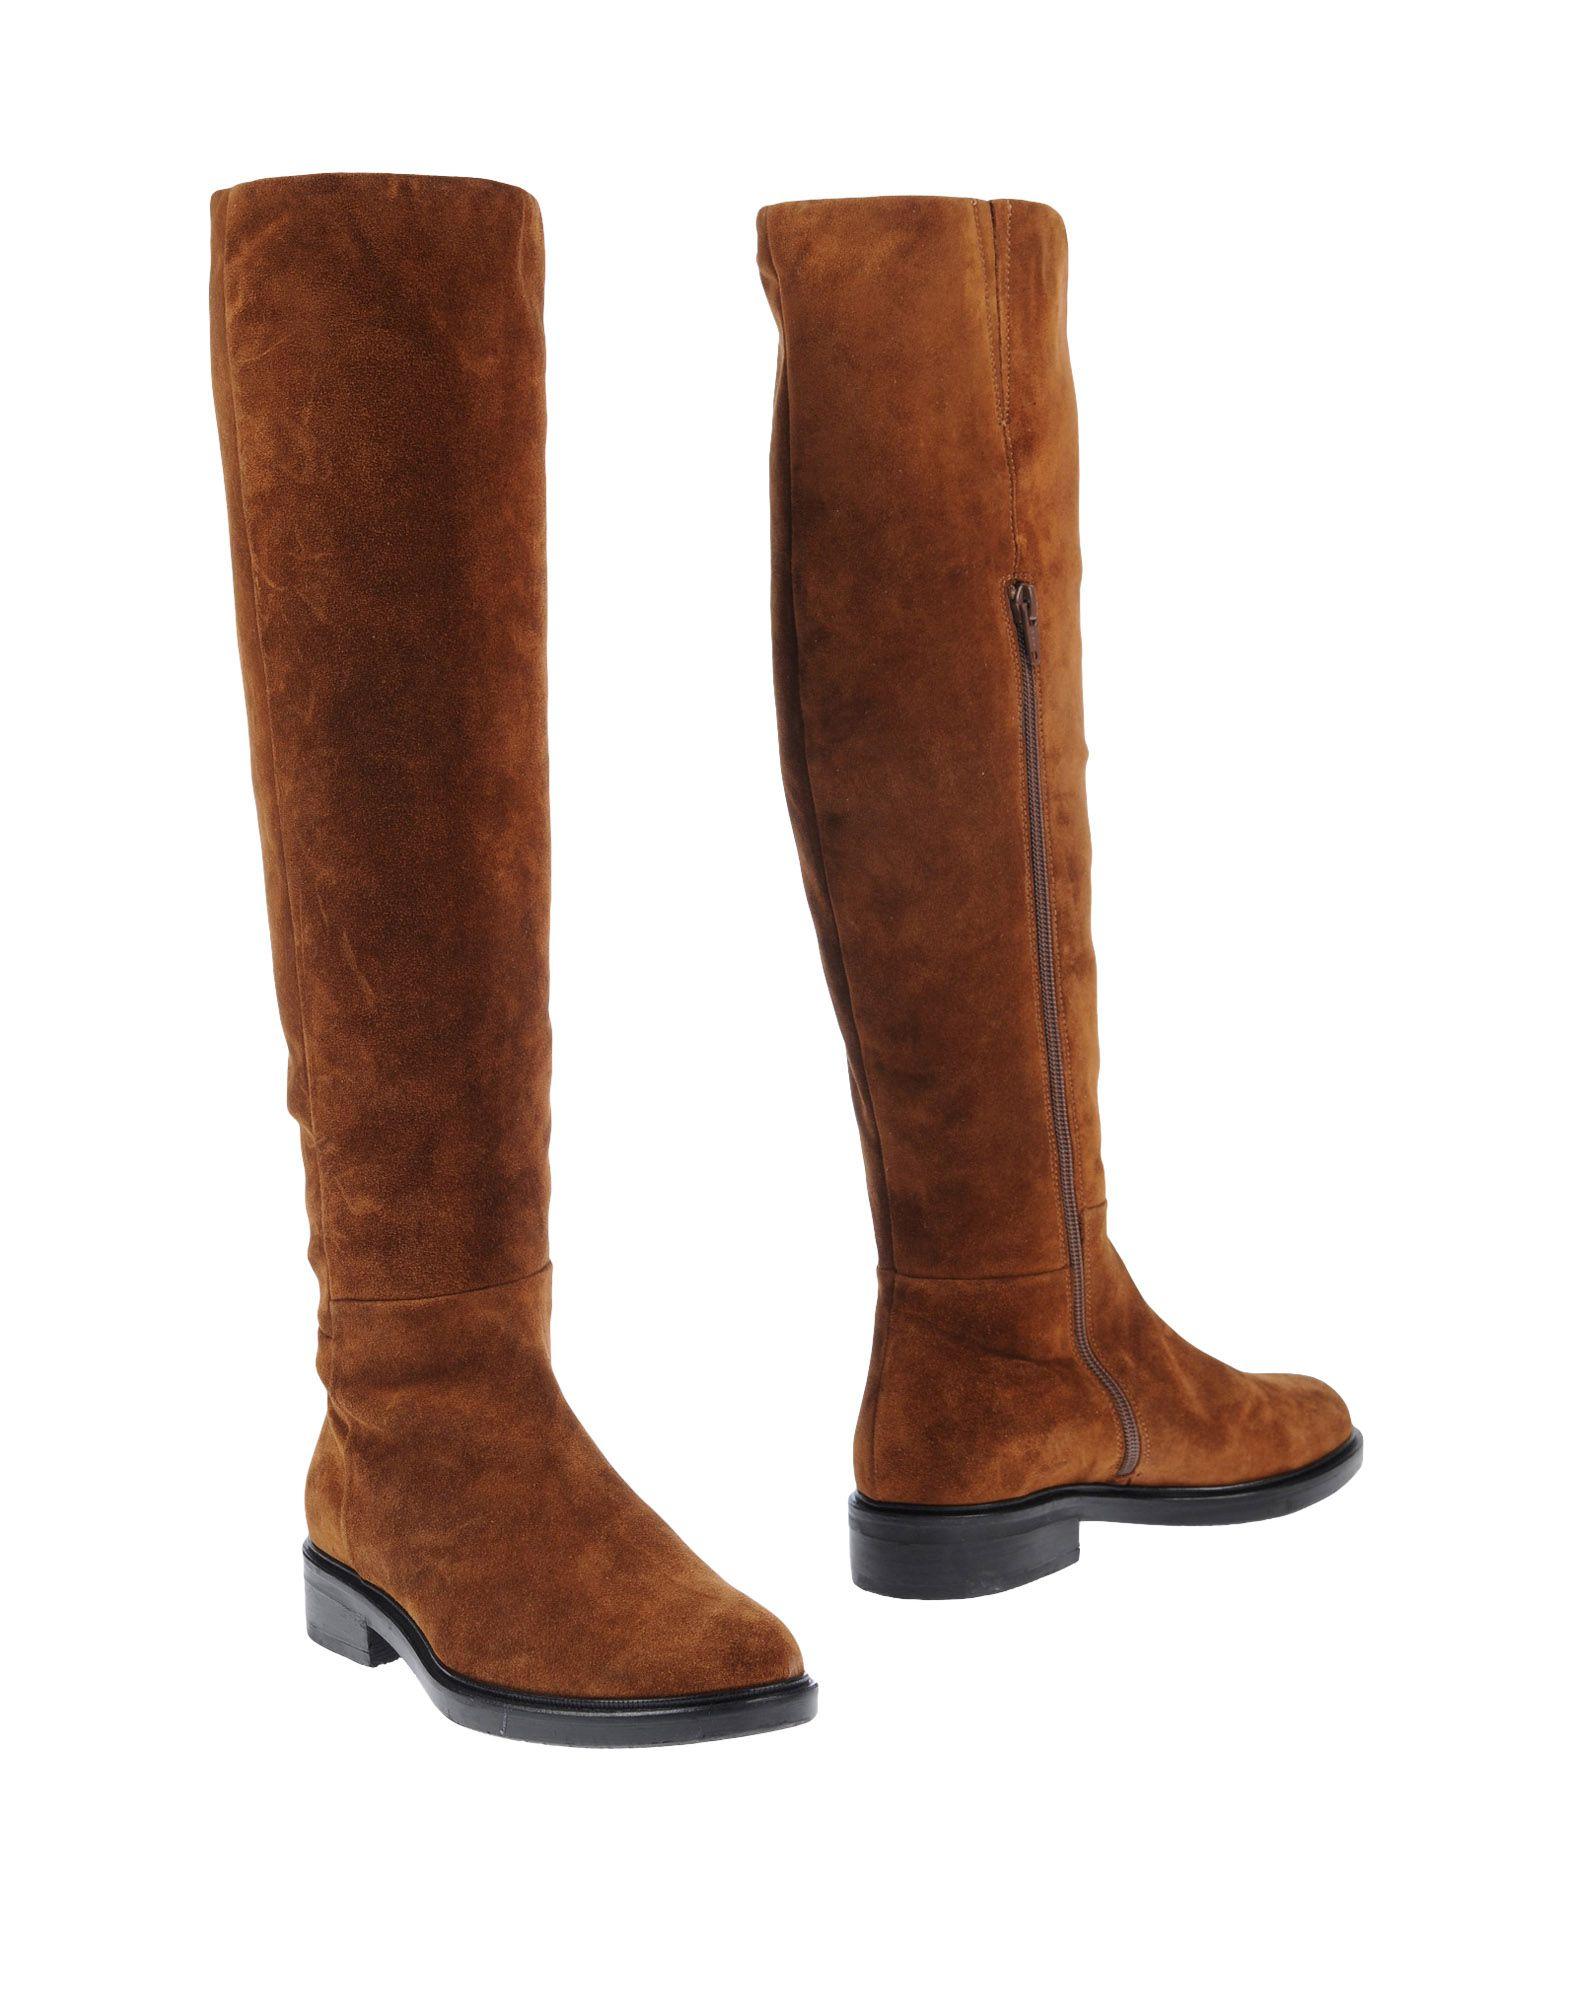 Cuoieria Boots - Women  Cuoieria Boots online on  Women United Kingdom - 11487295OP a2efe0